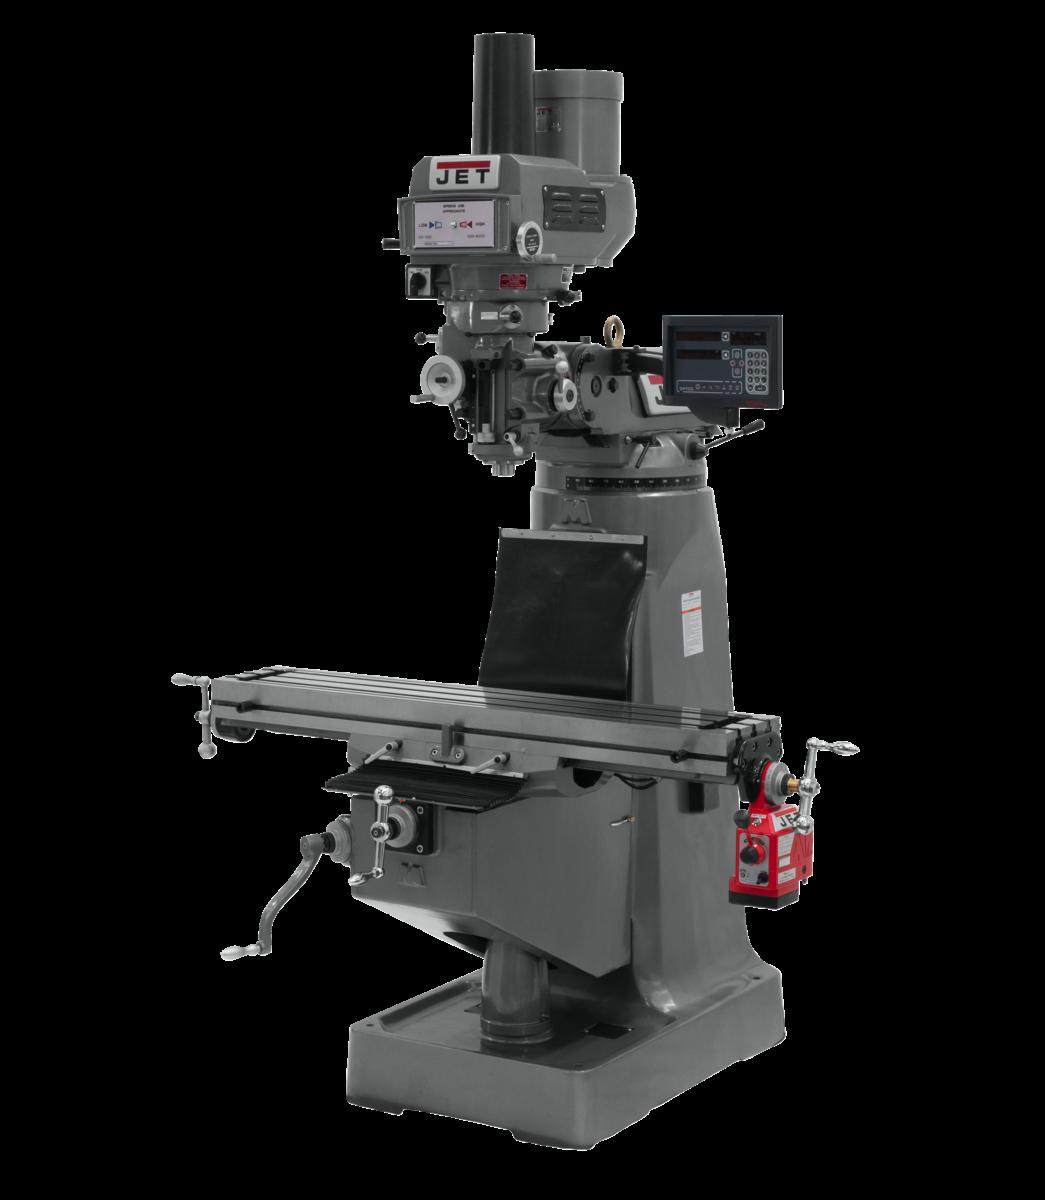 JTM-4VS DP700 DRO X POWEREED & AIR DRWBR